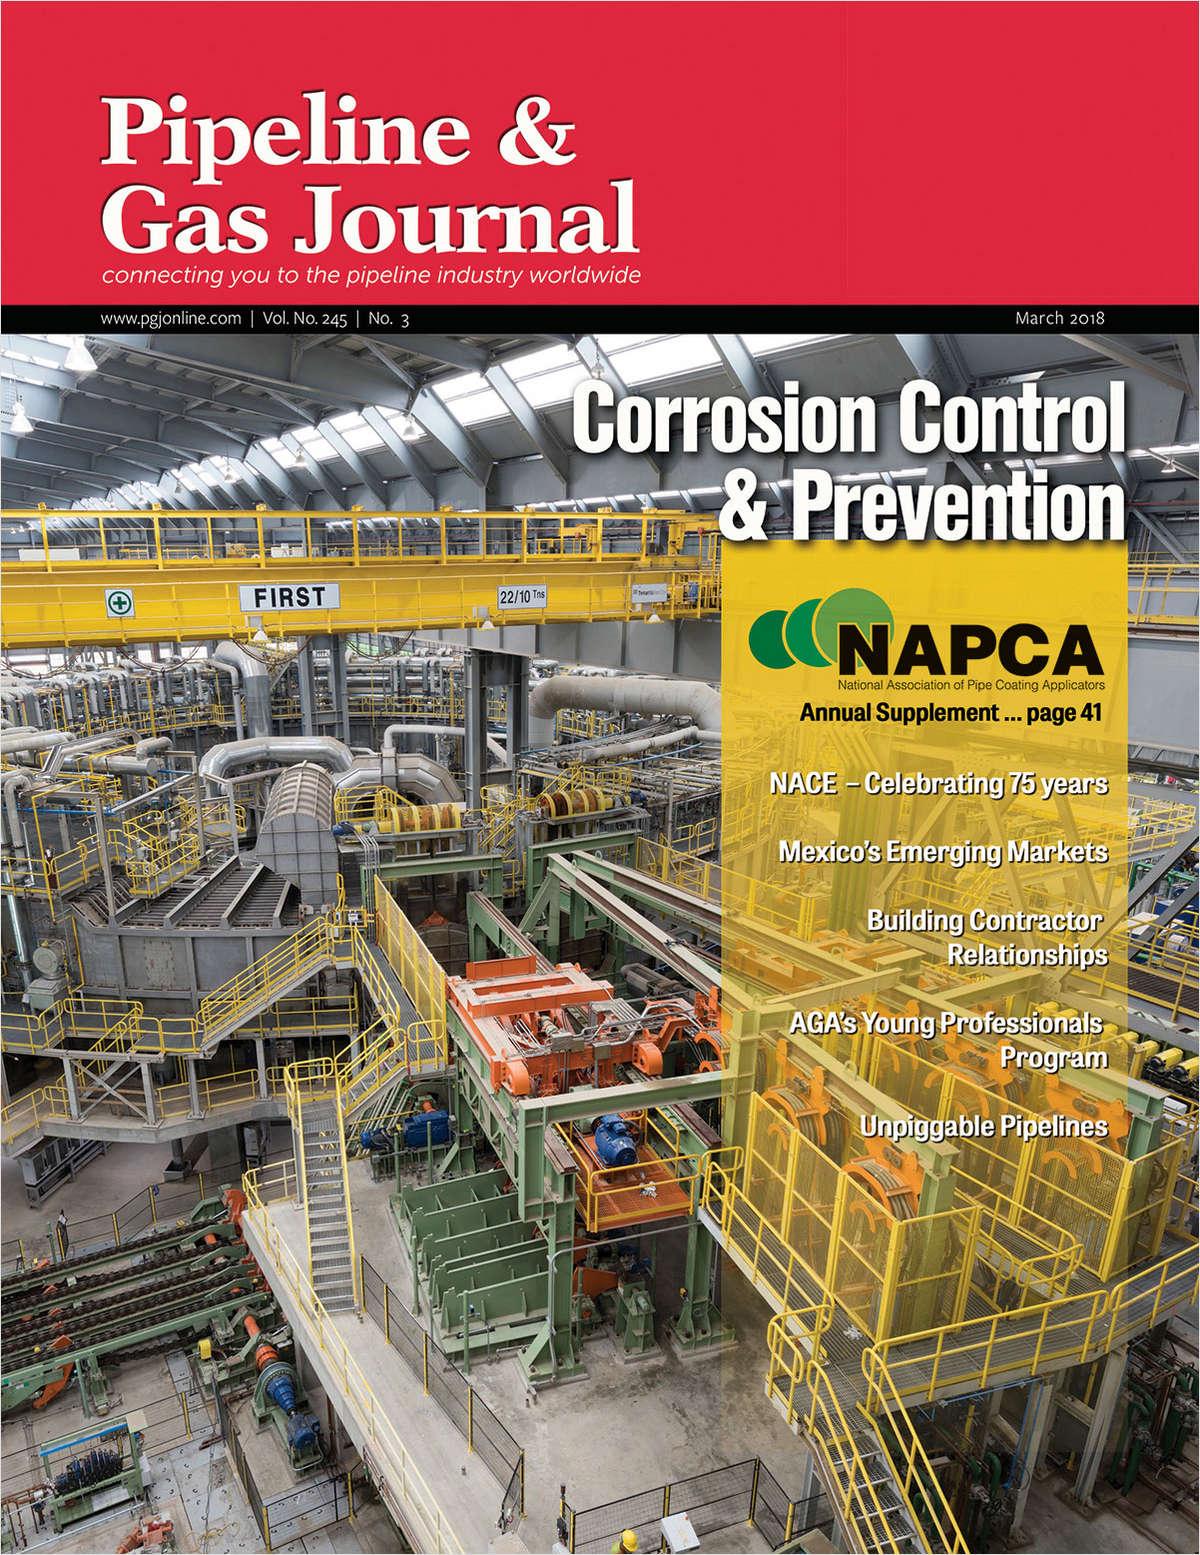 Pipeline & Gas Journal